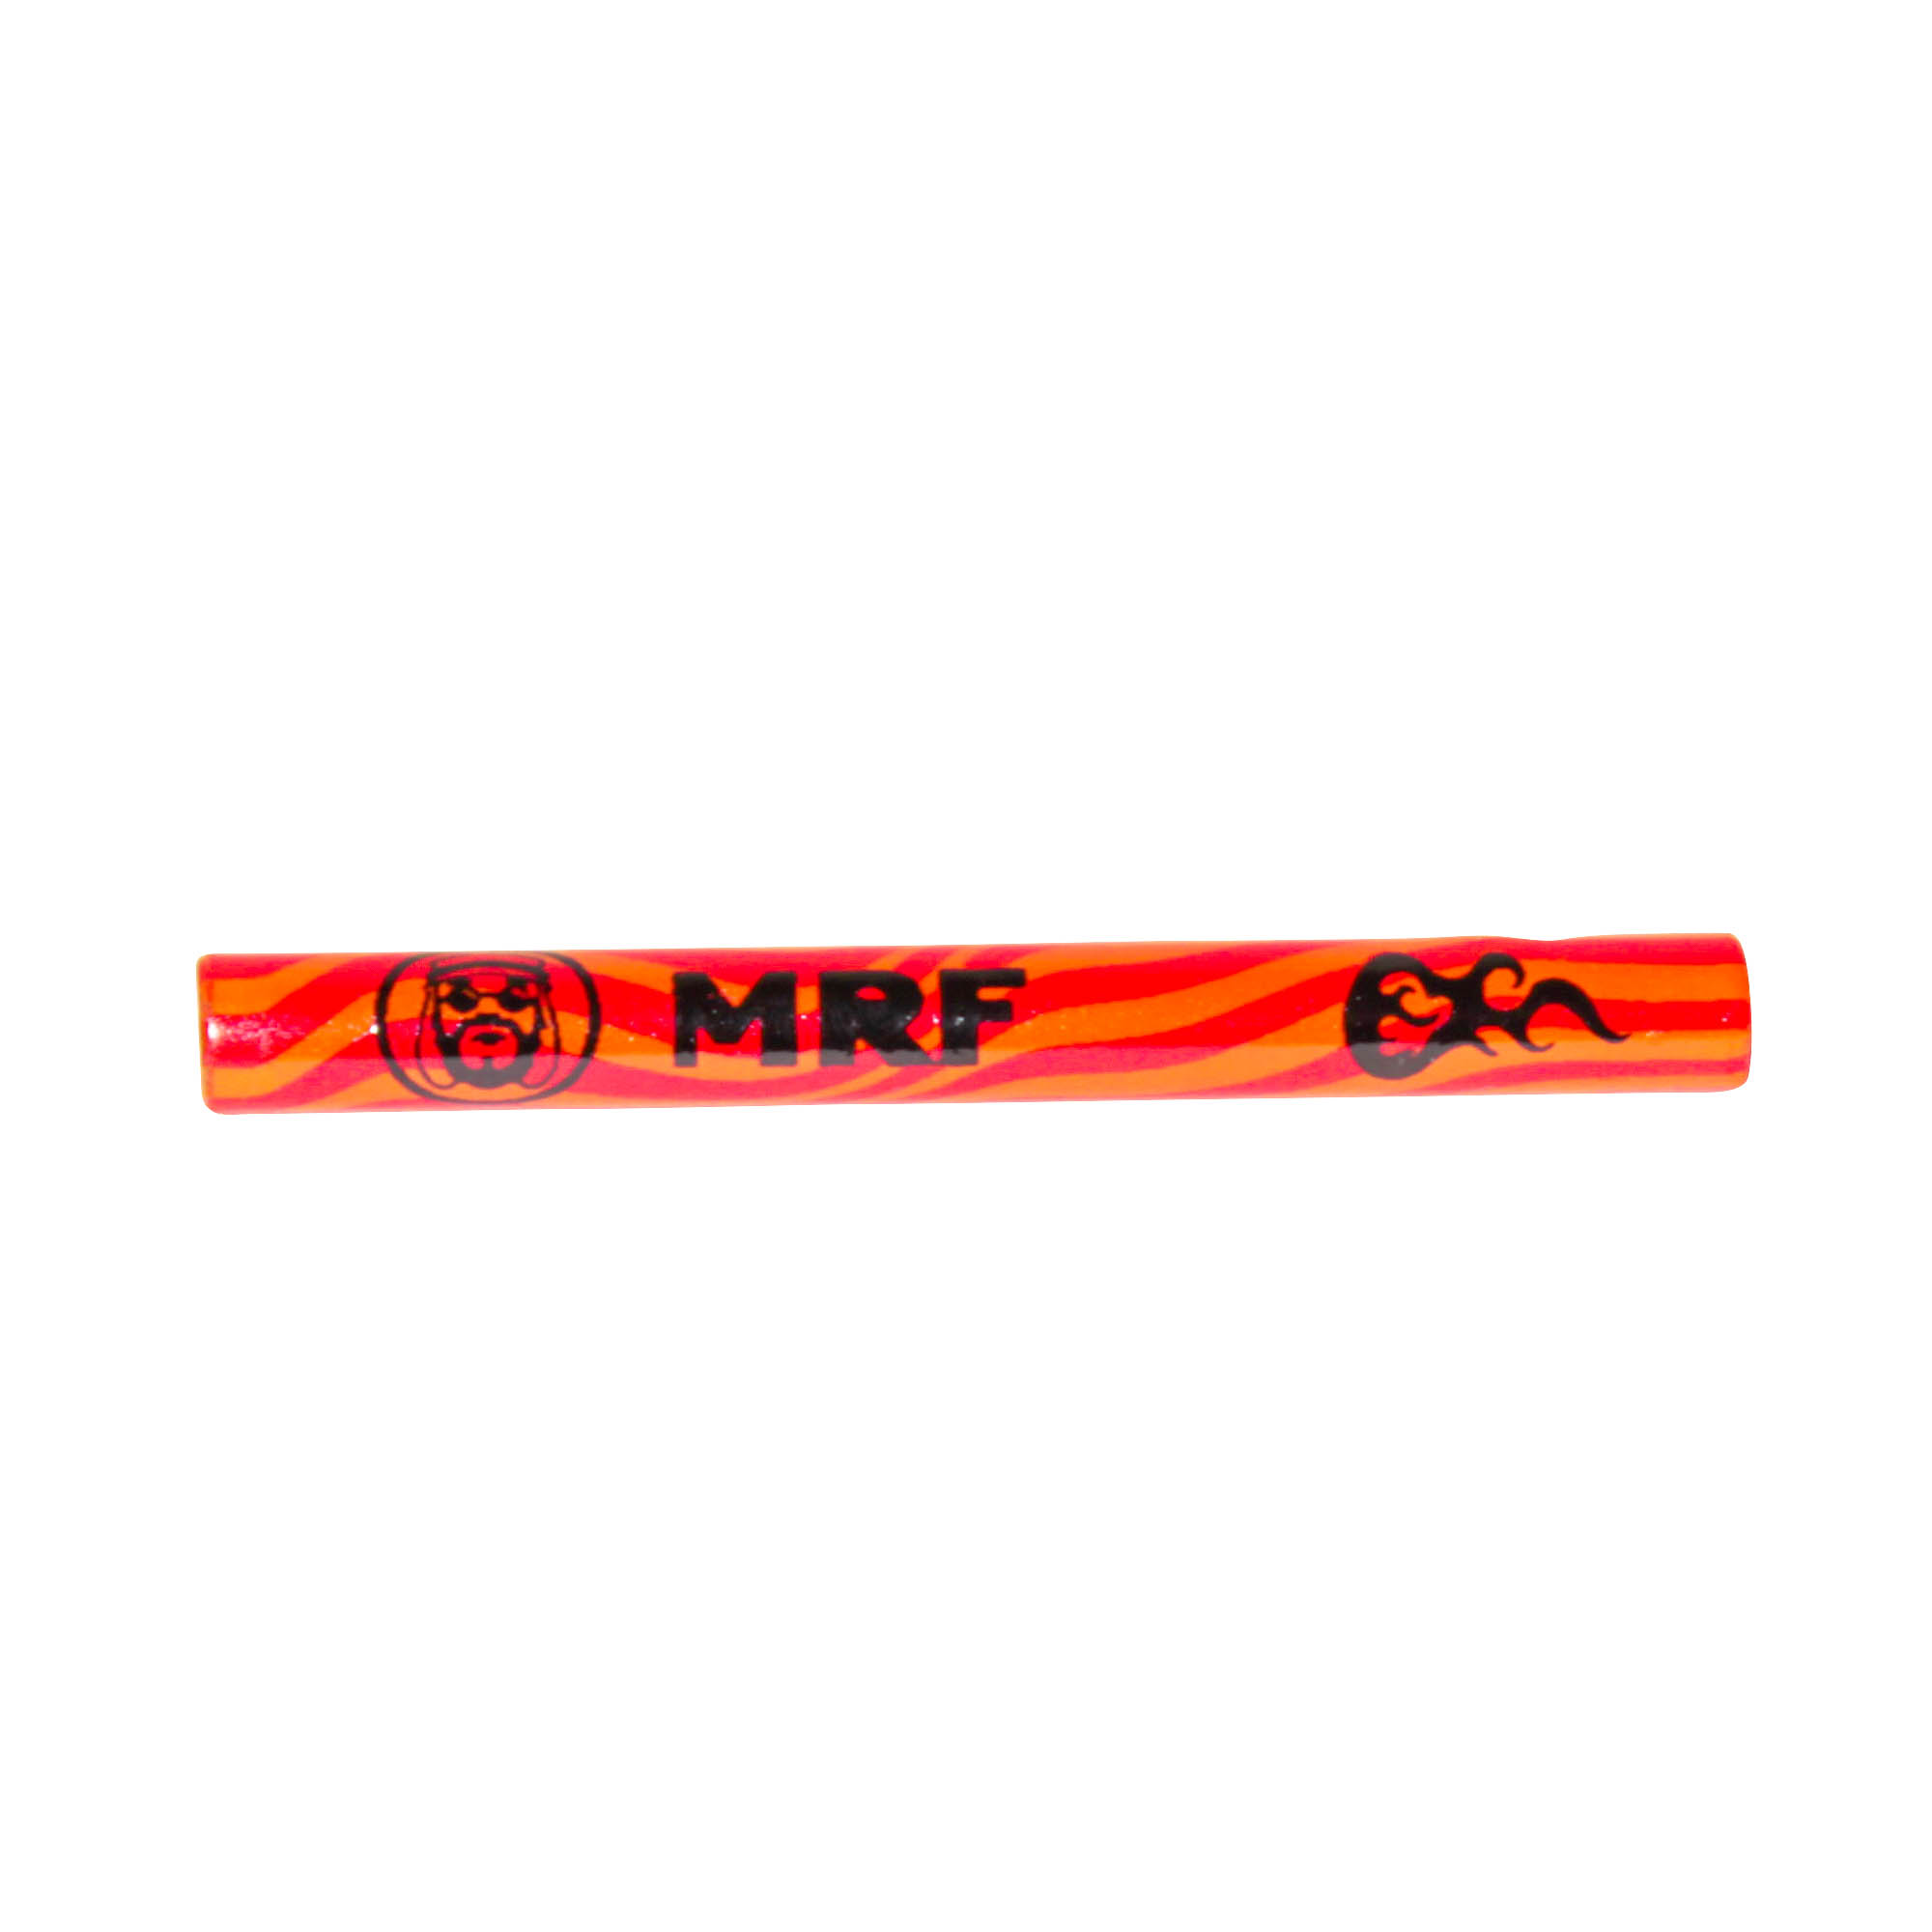 Piteira de Vidro MRF Elements Classic - Fogo (6 mm)  - Mr. Fumo